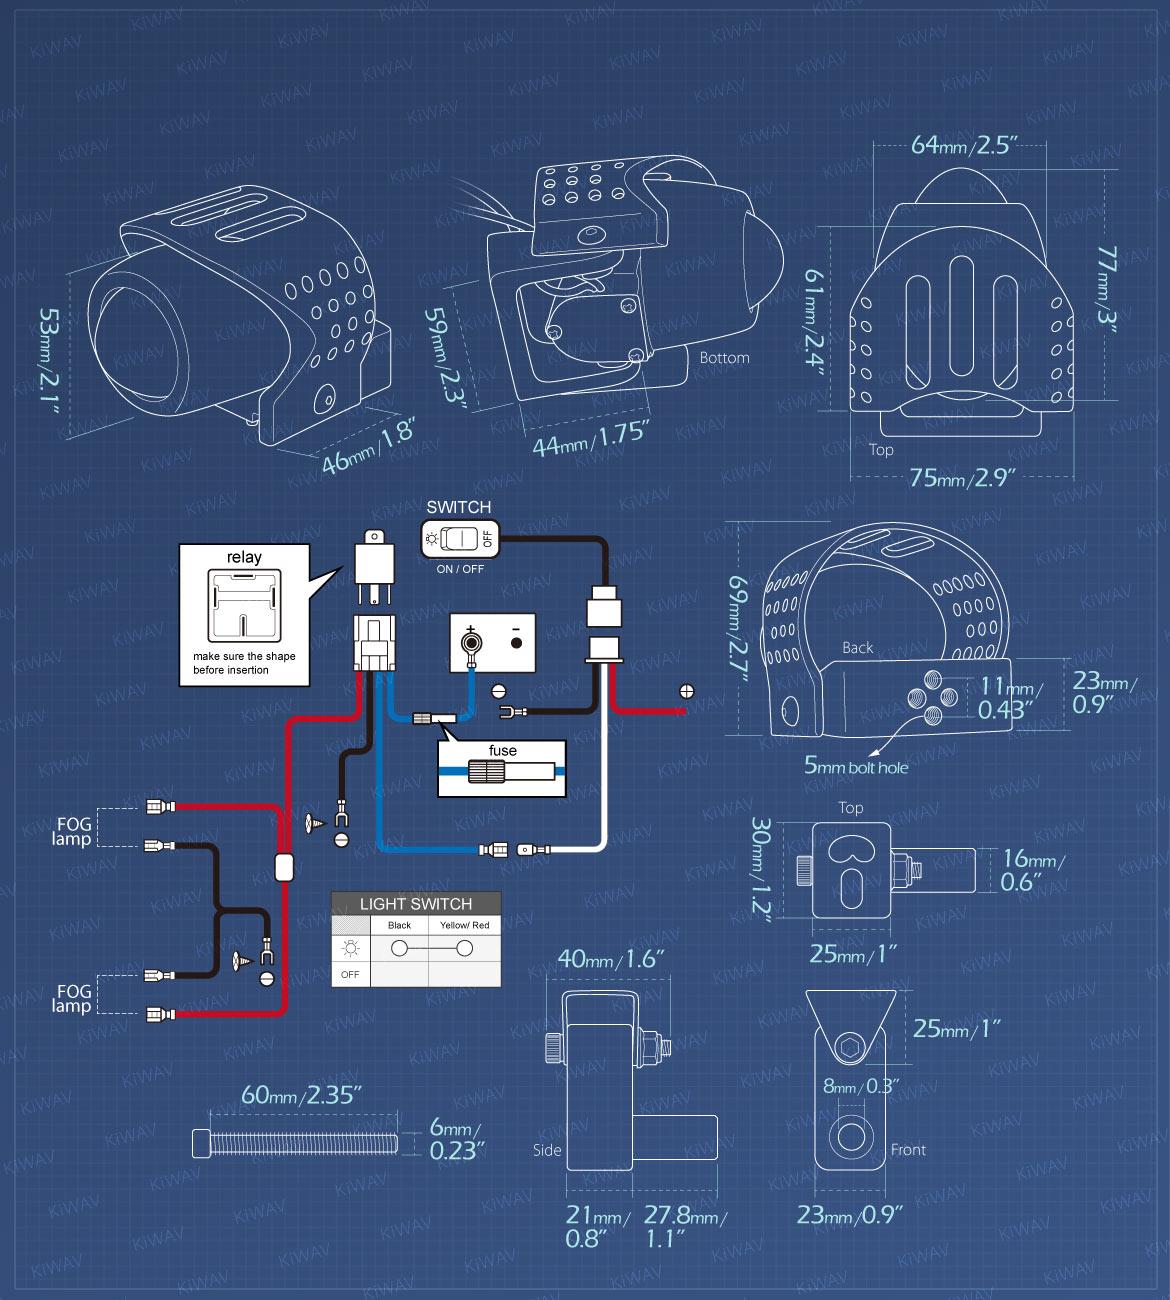 Measurement of KiWAV motorcycle 12V 55W fisheye round fog light with wiring kits